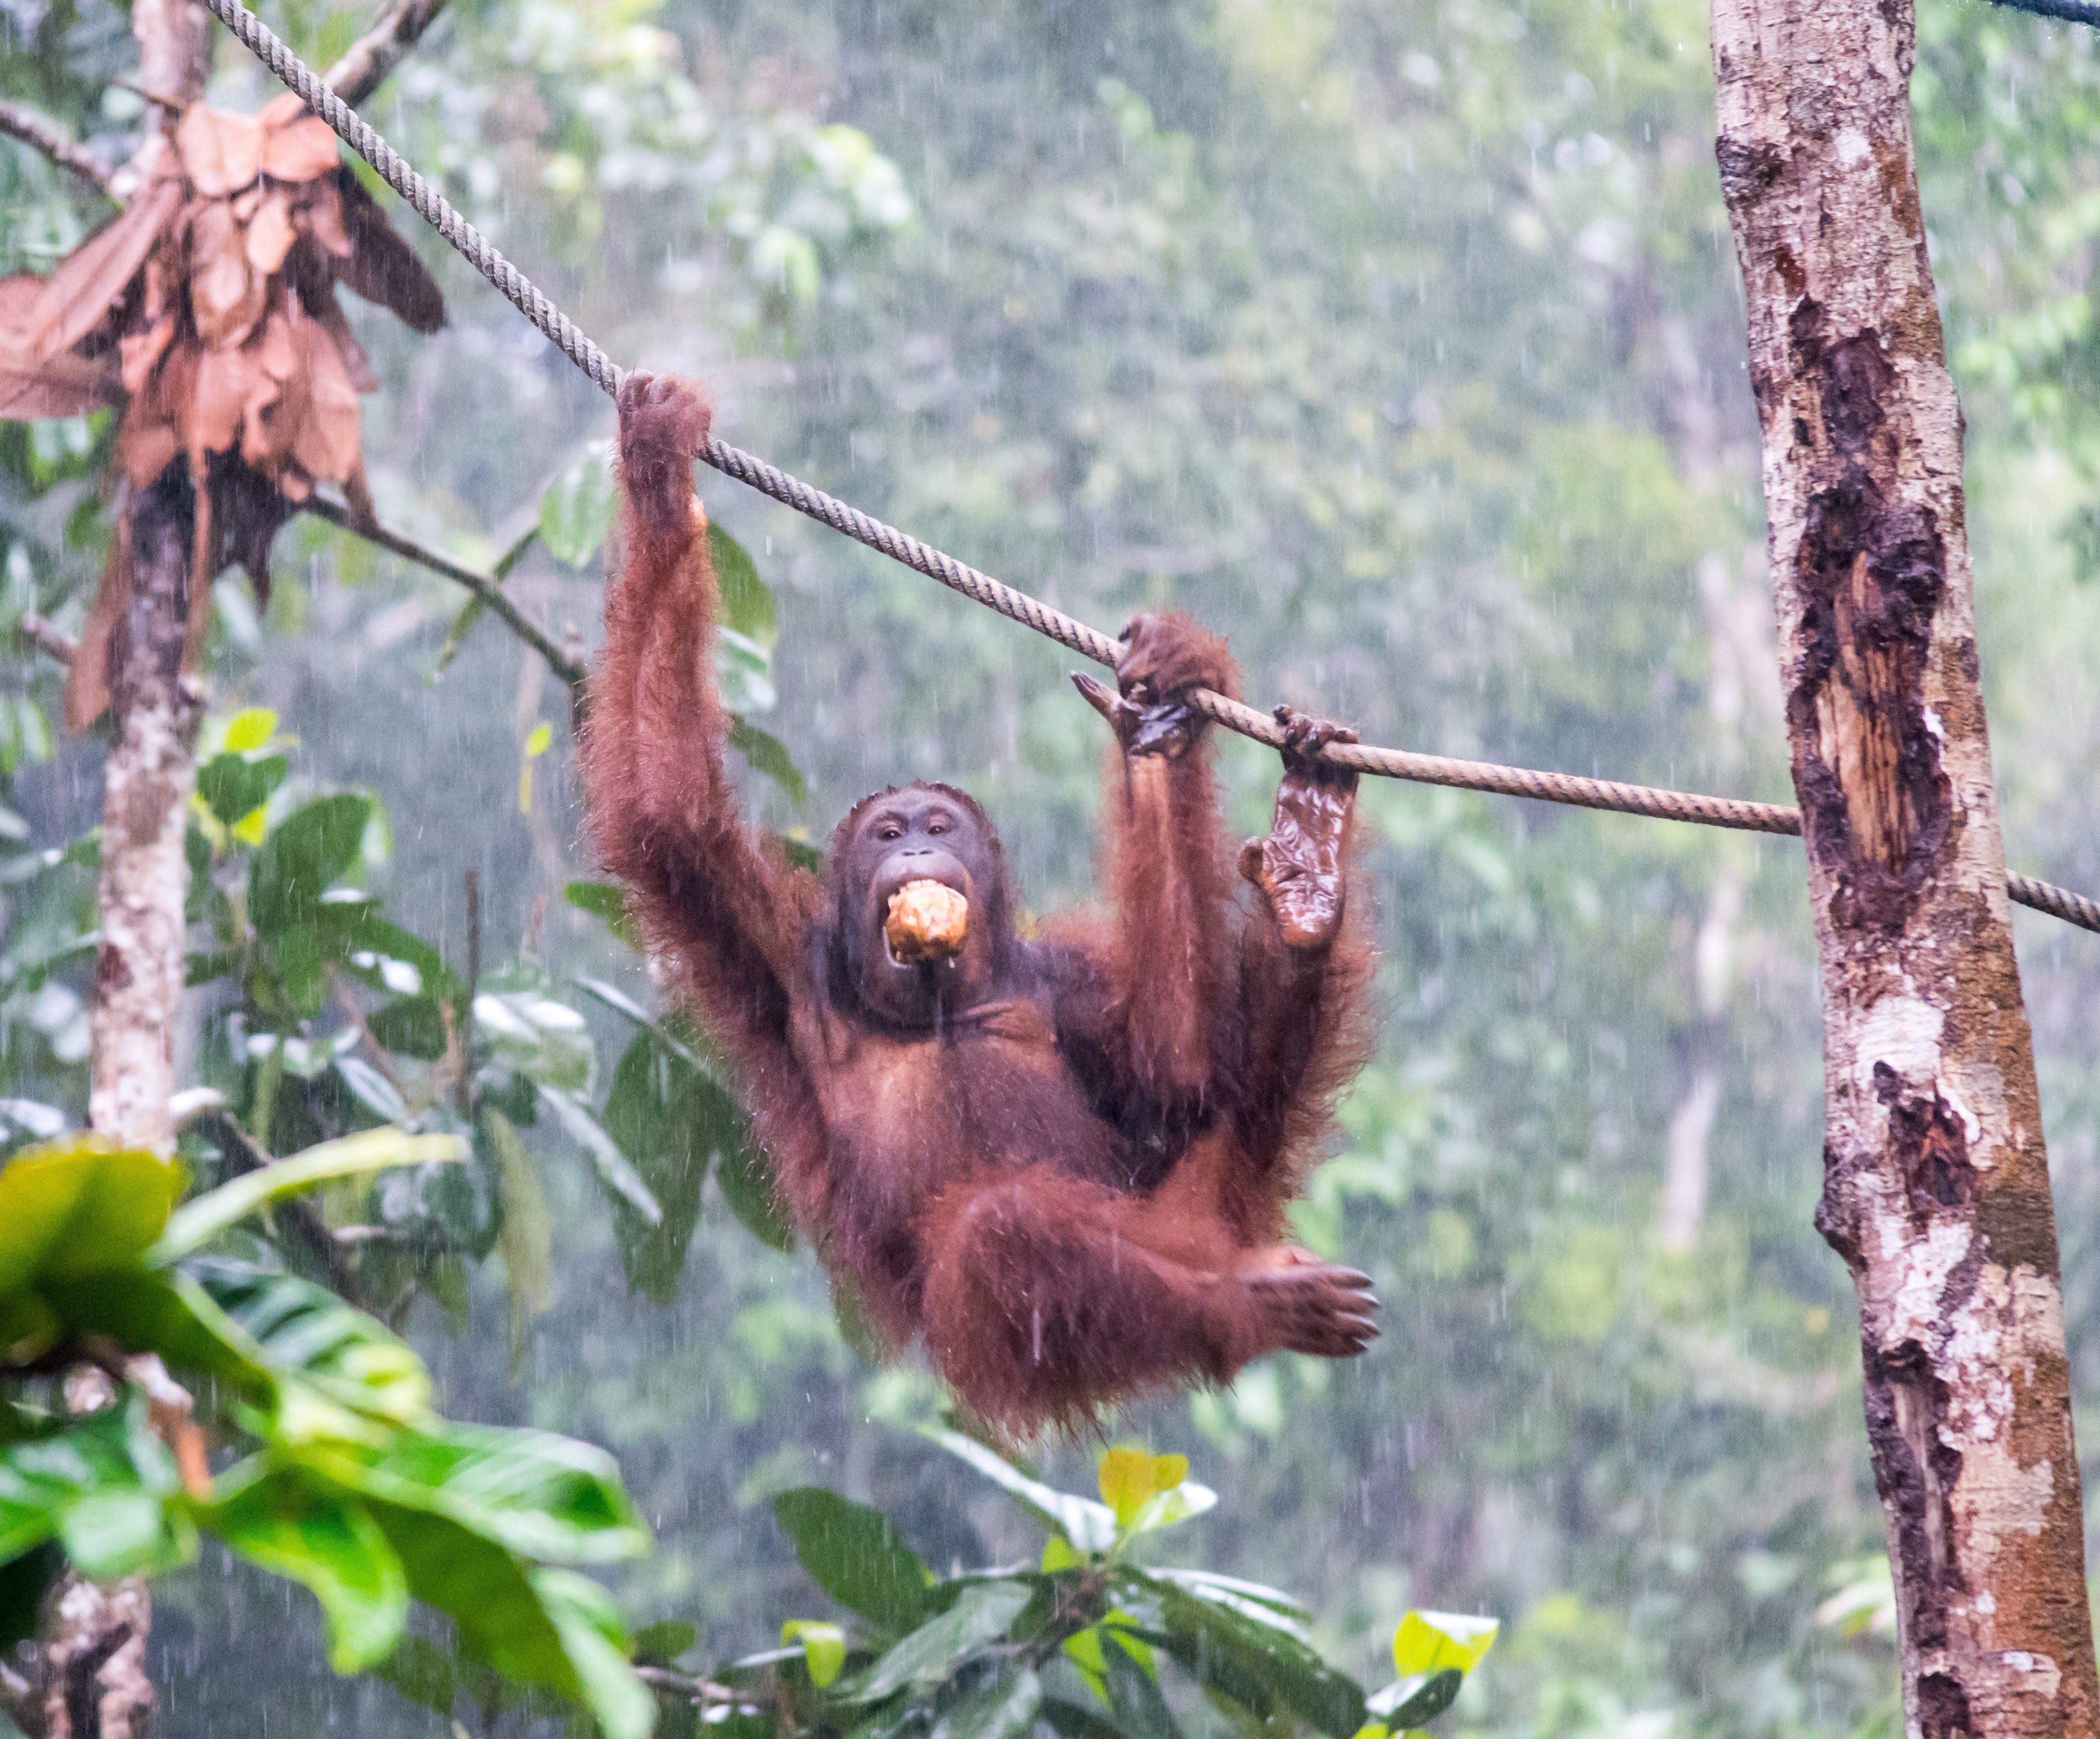 Orangutan Semenggoh